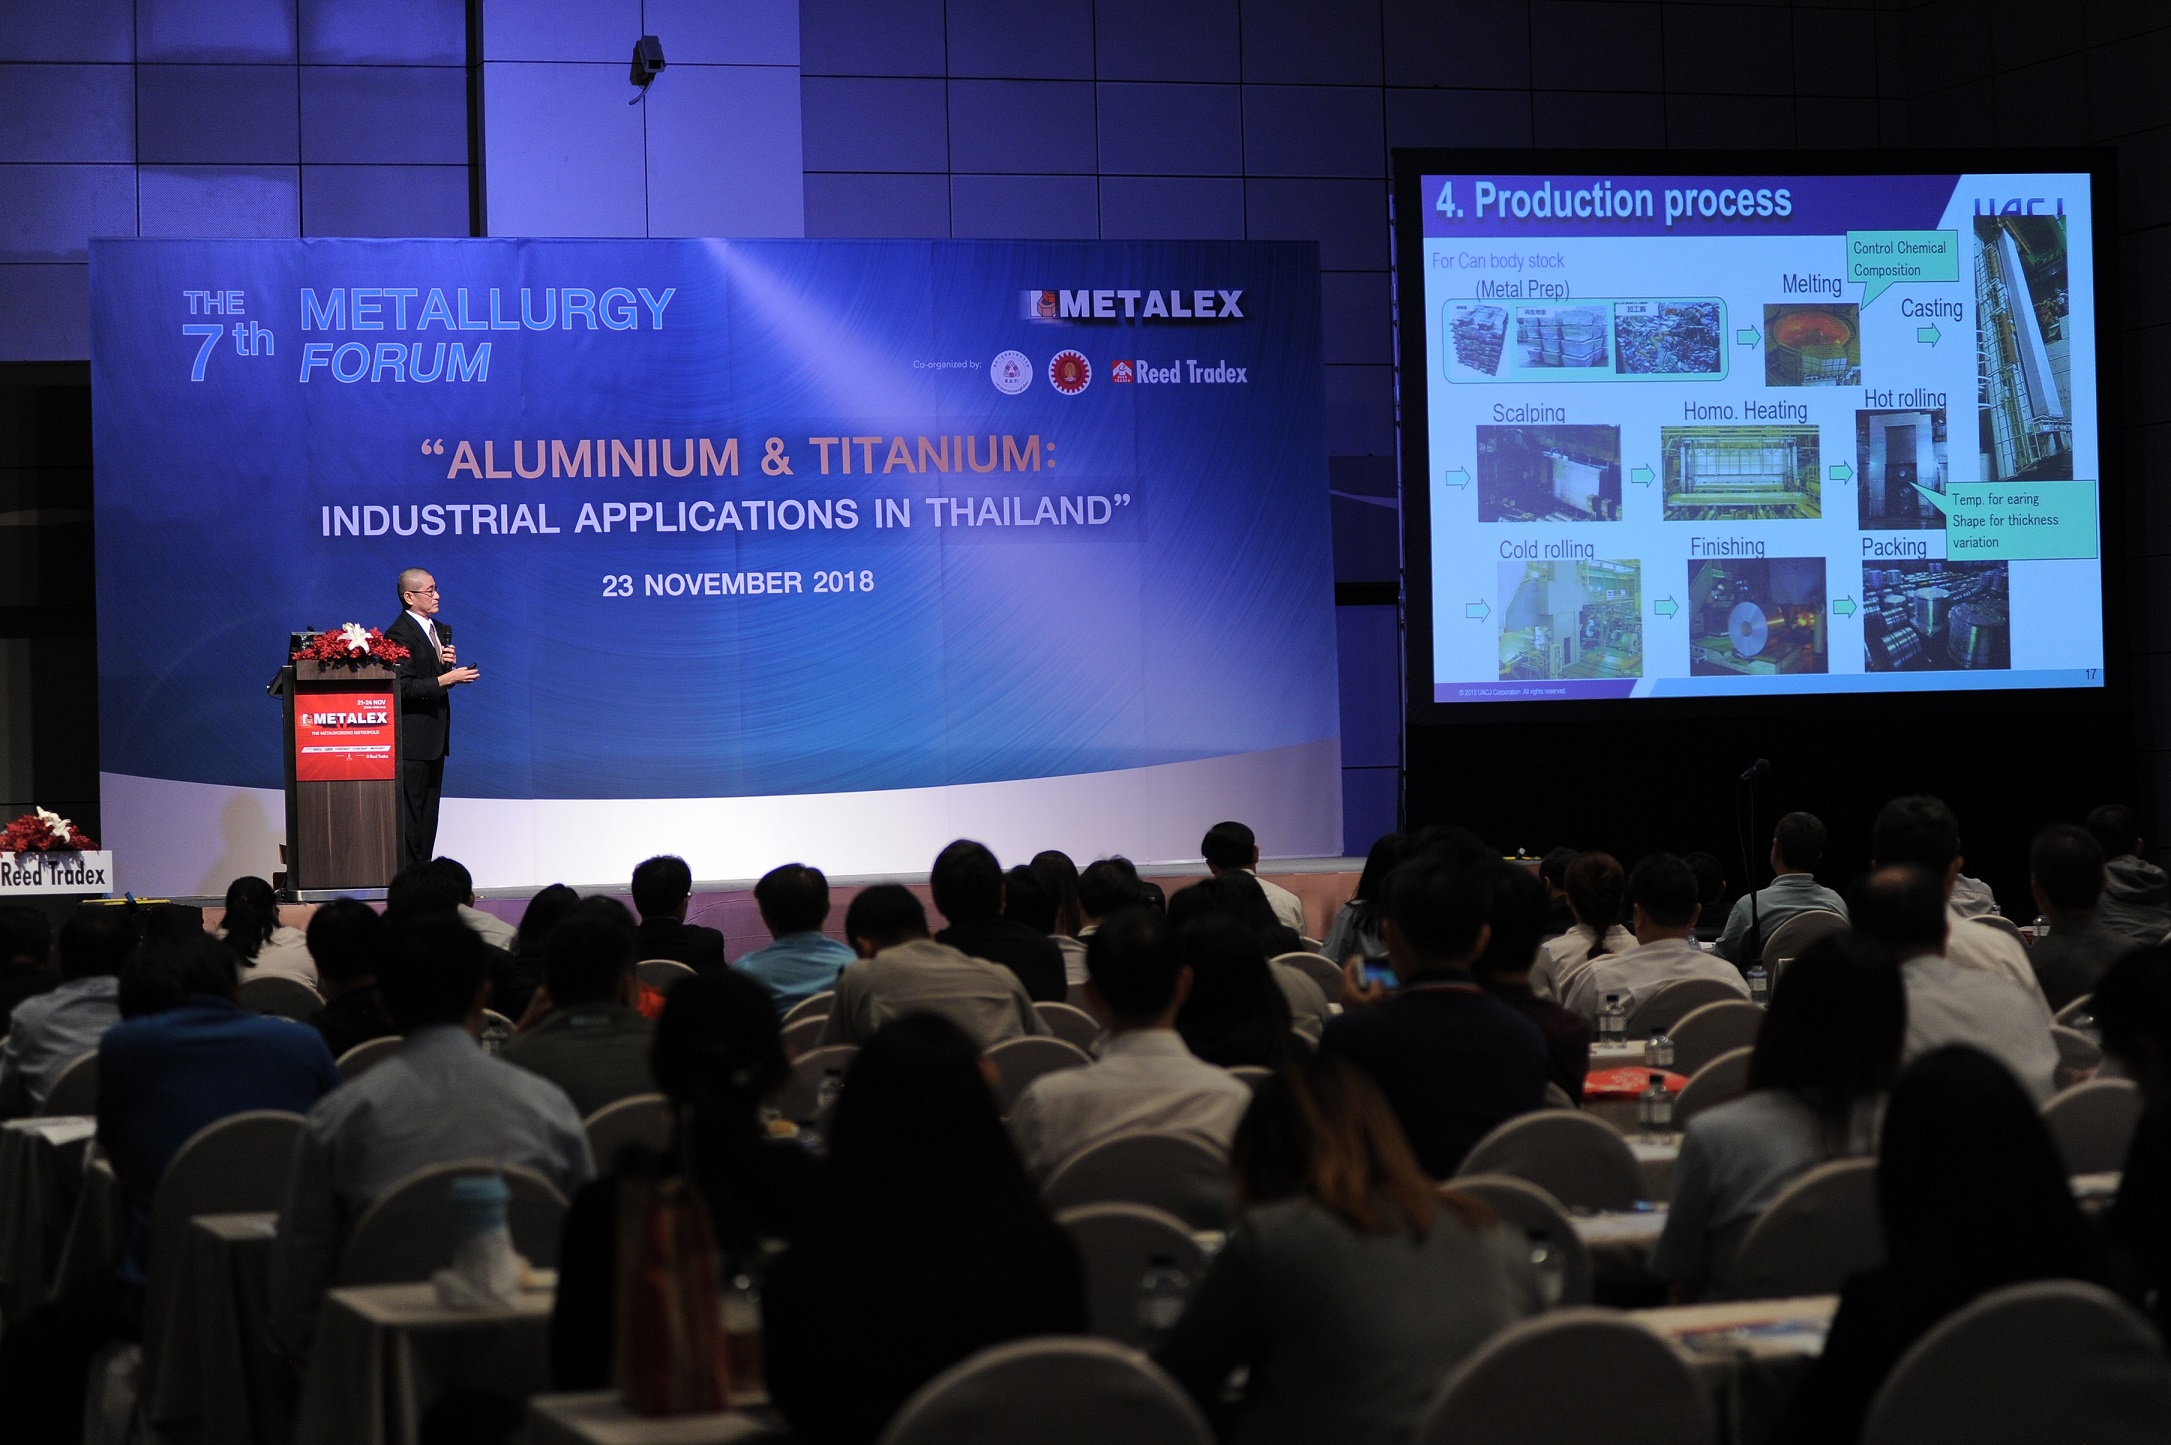 METALEXで金属工学に関するセミナー開催